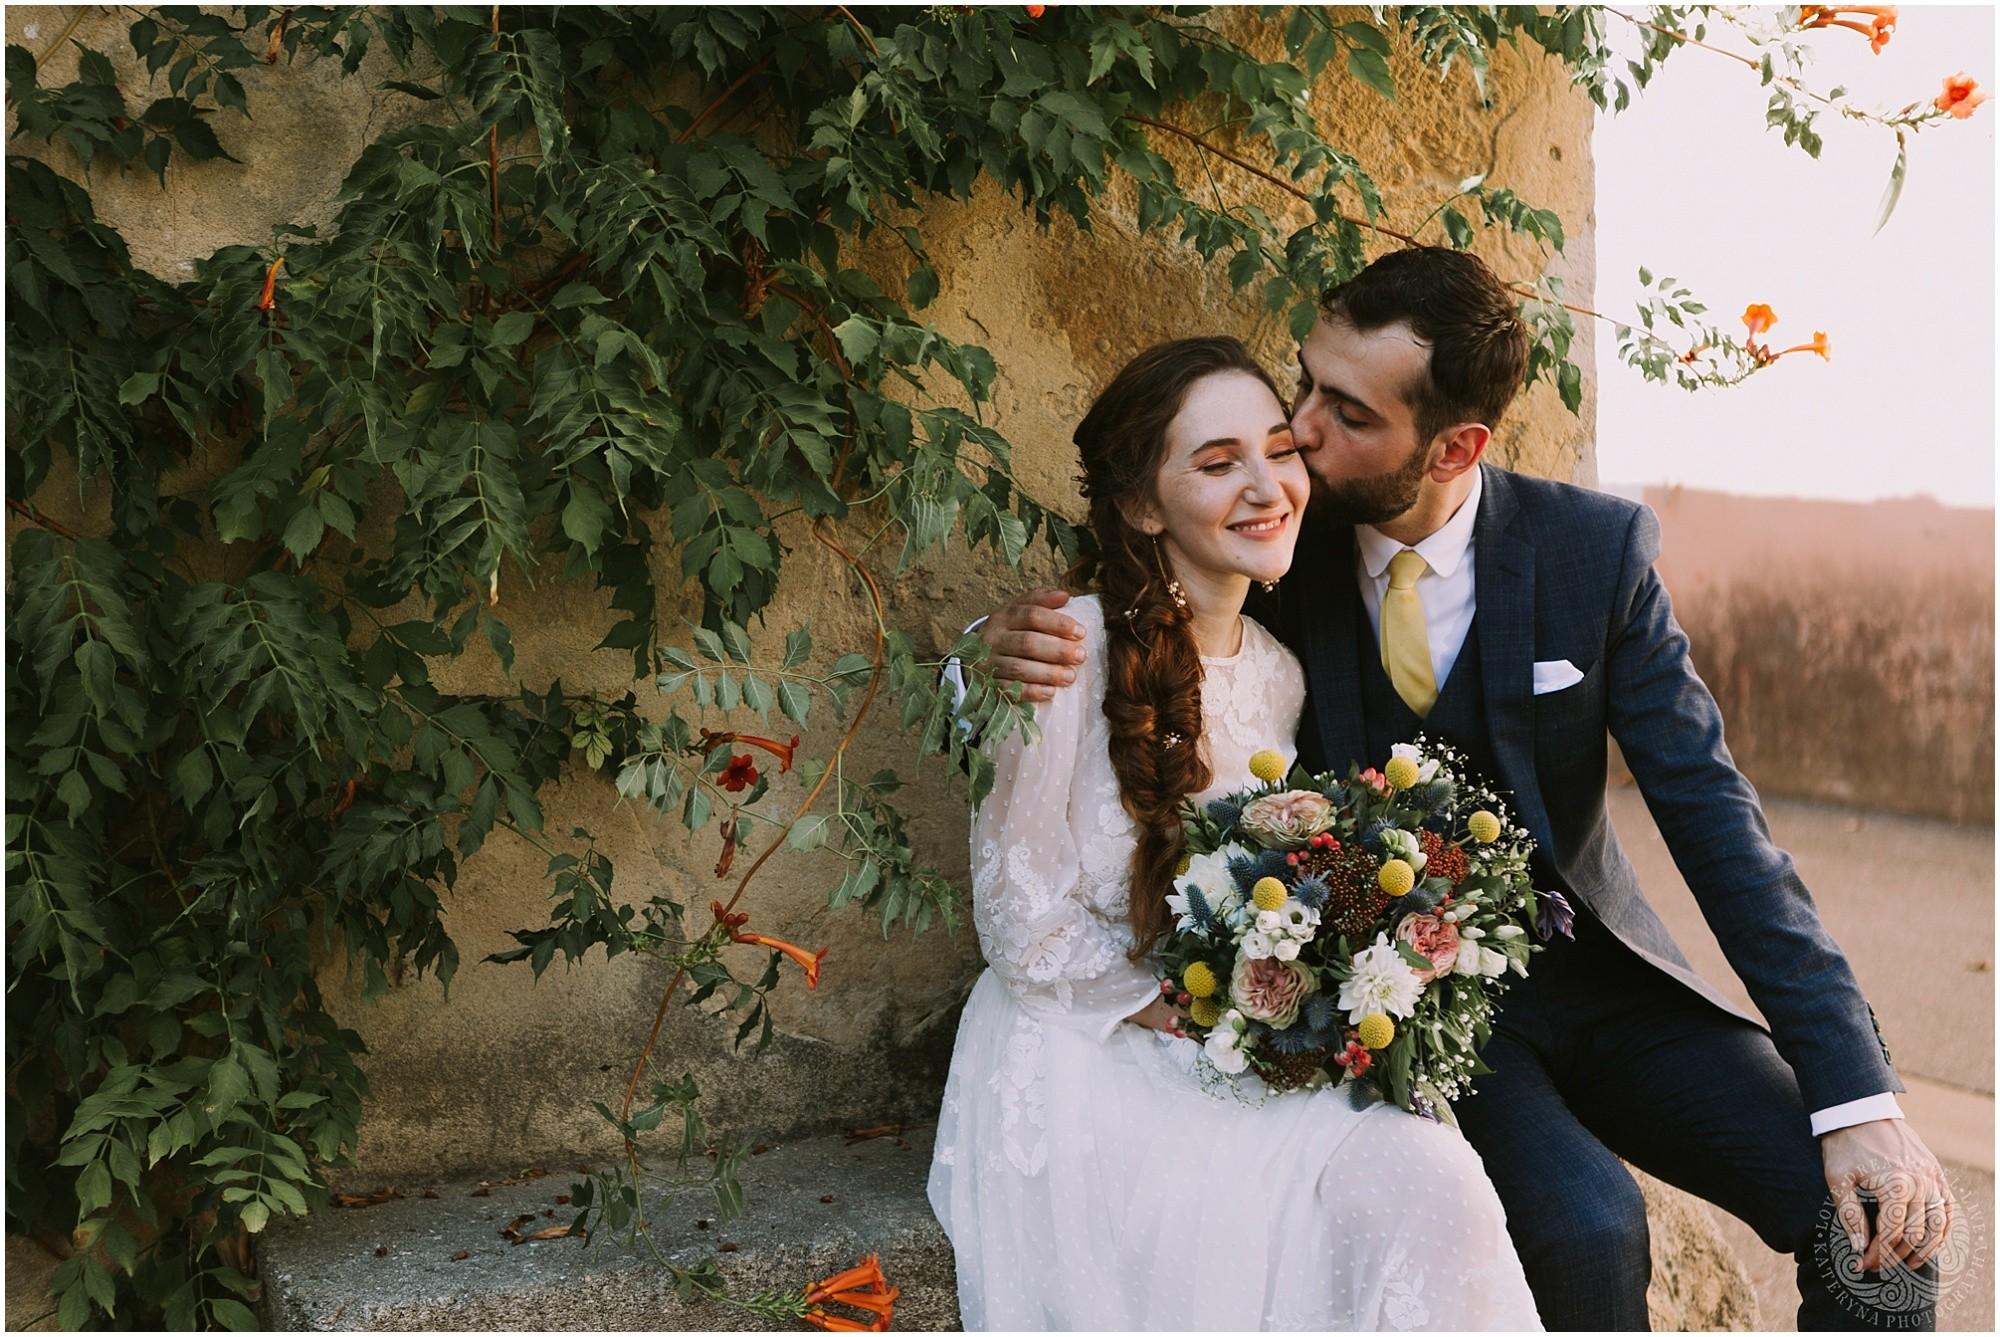 Kateryna-photos-photographe-mariage-vaucluse-provence-avignon-ferme-st-hugues_0047.jpg